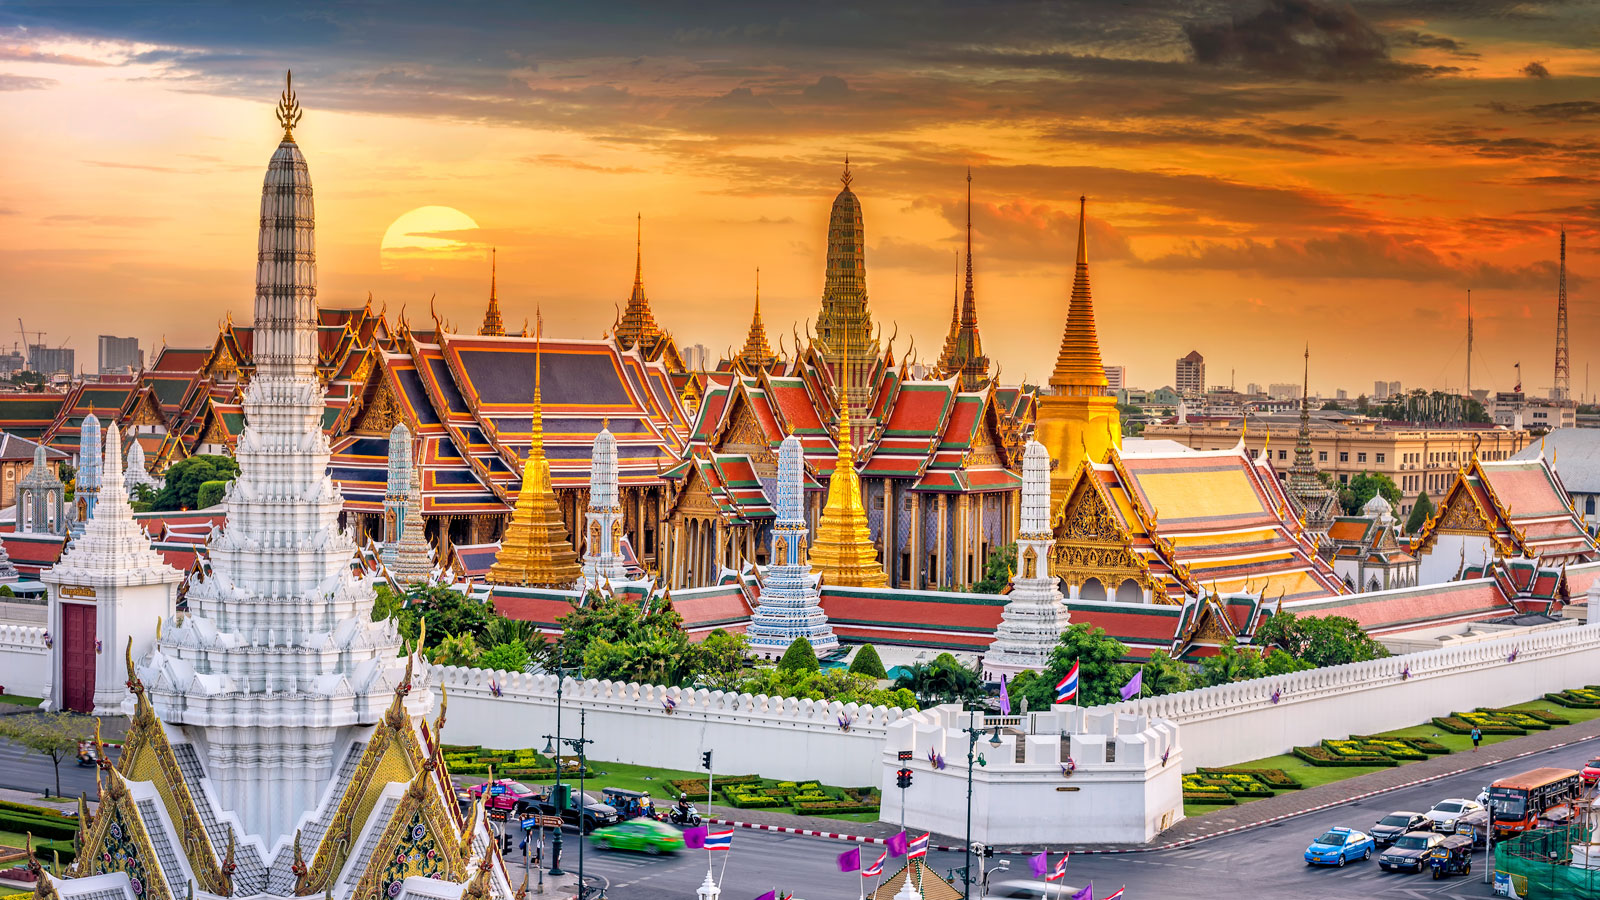 Grabd Palace Thailand